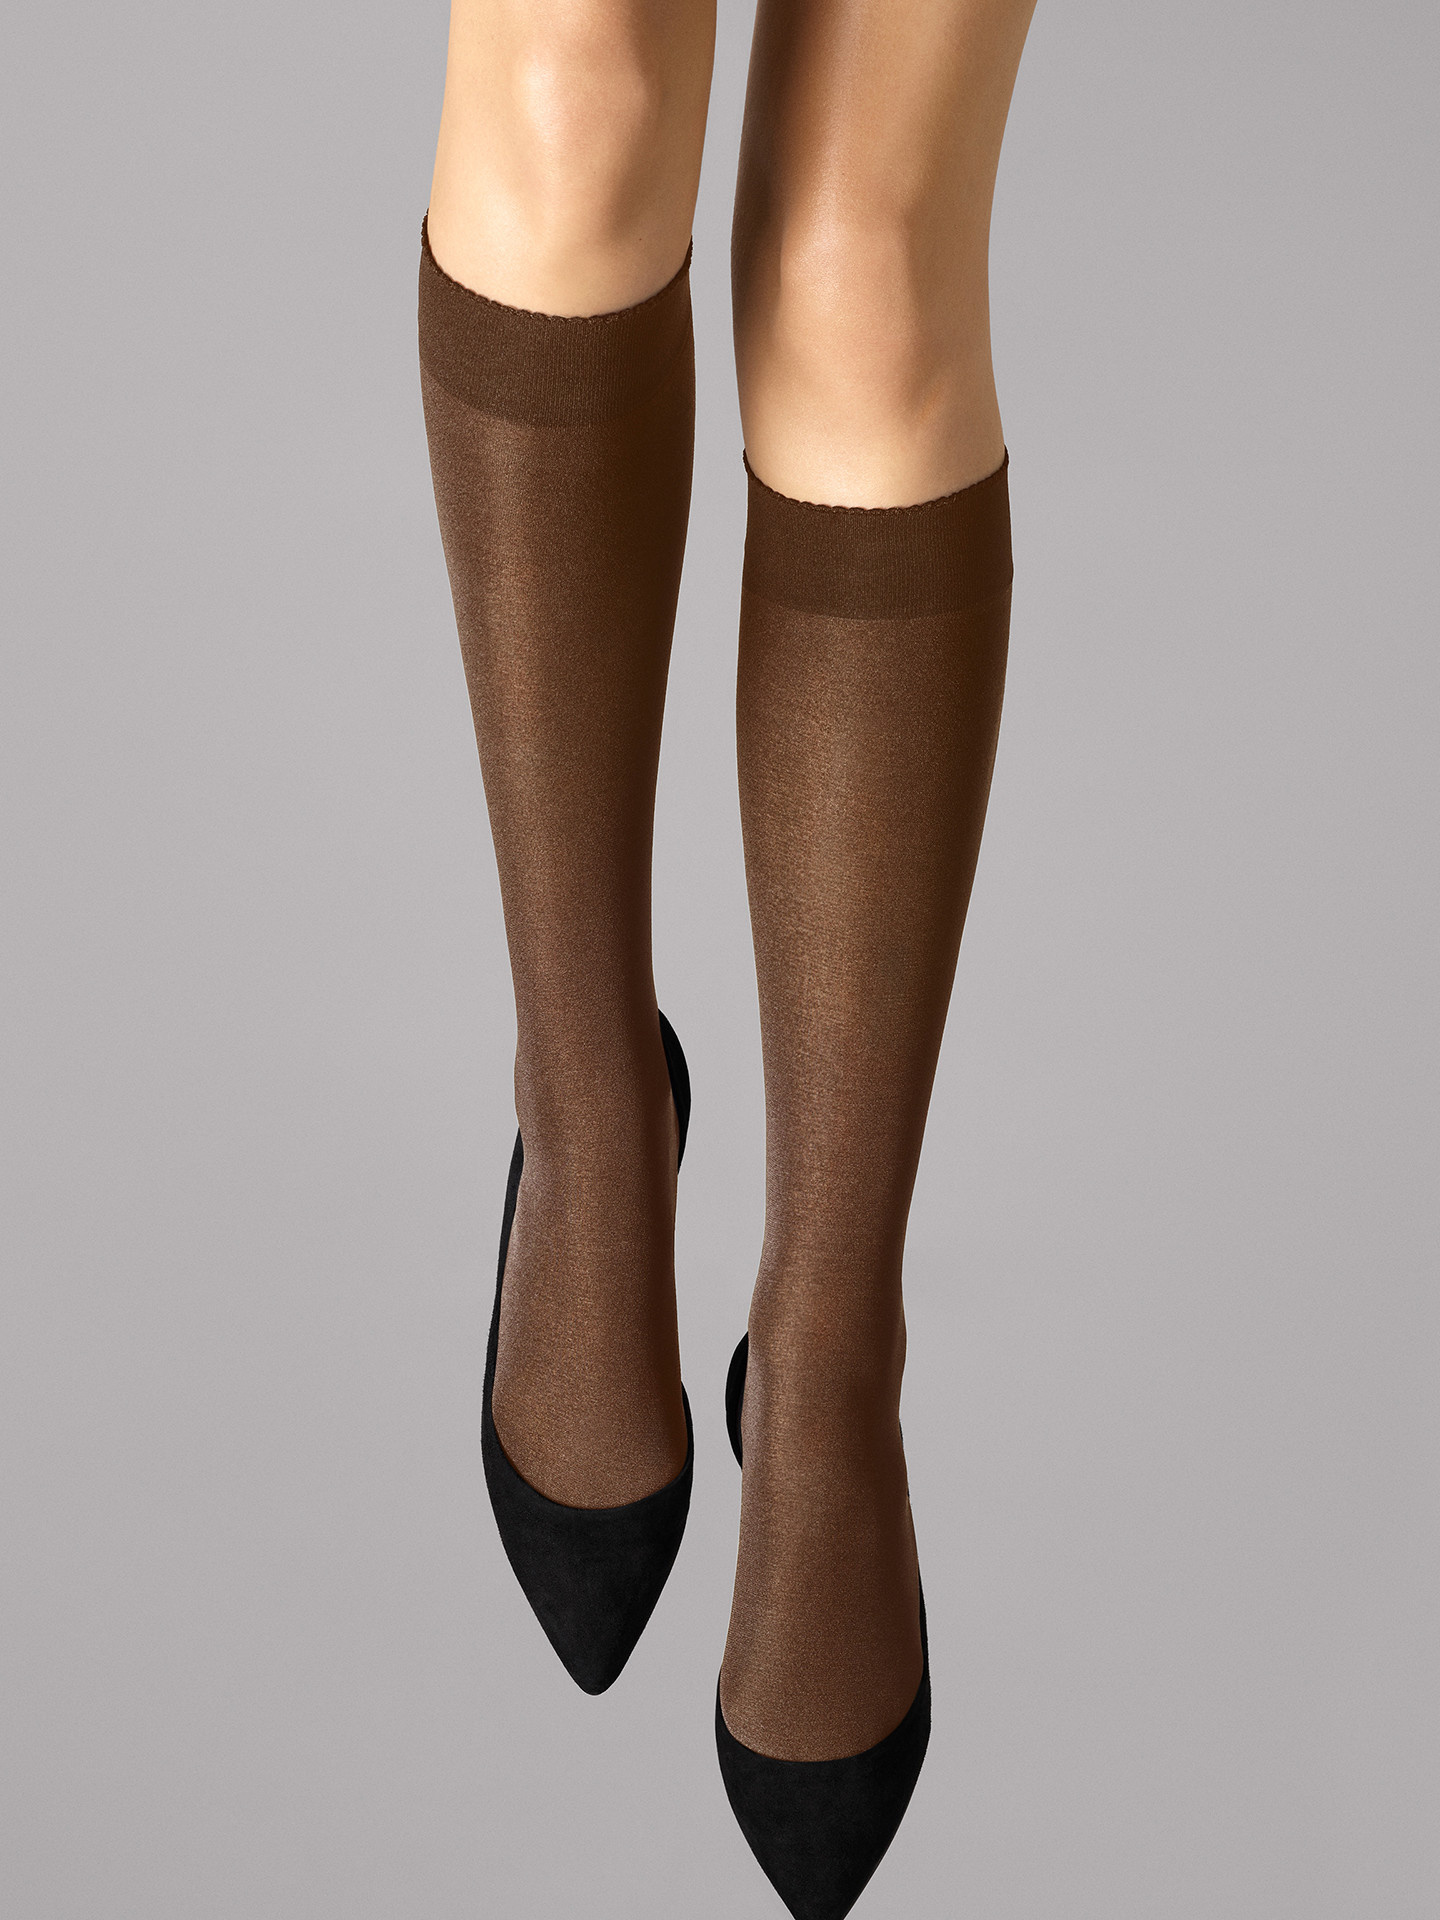 WOLFORD 30923 Velvet de Luxe 50 Knee-Highs